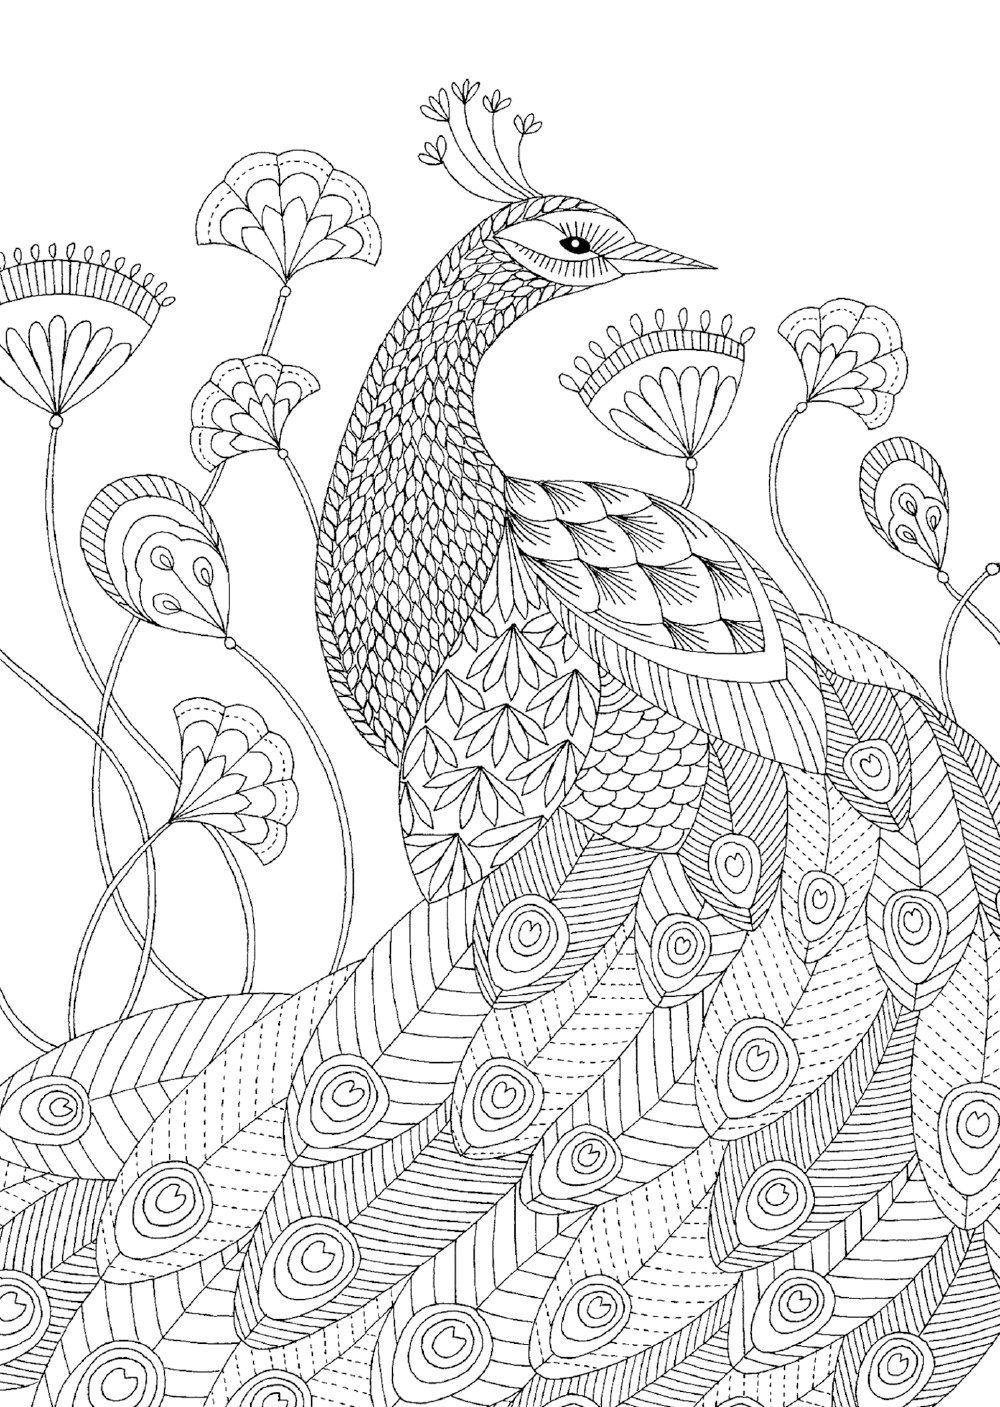 81uru31 Nel Jpg 1000 1407 Animal Coloring Pages Millie Marotta Animal Kingdom Coloring Books